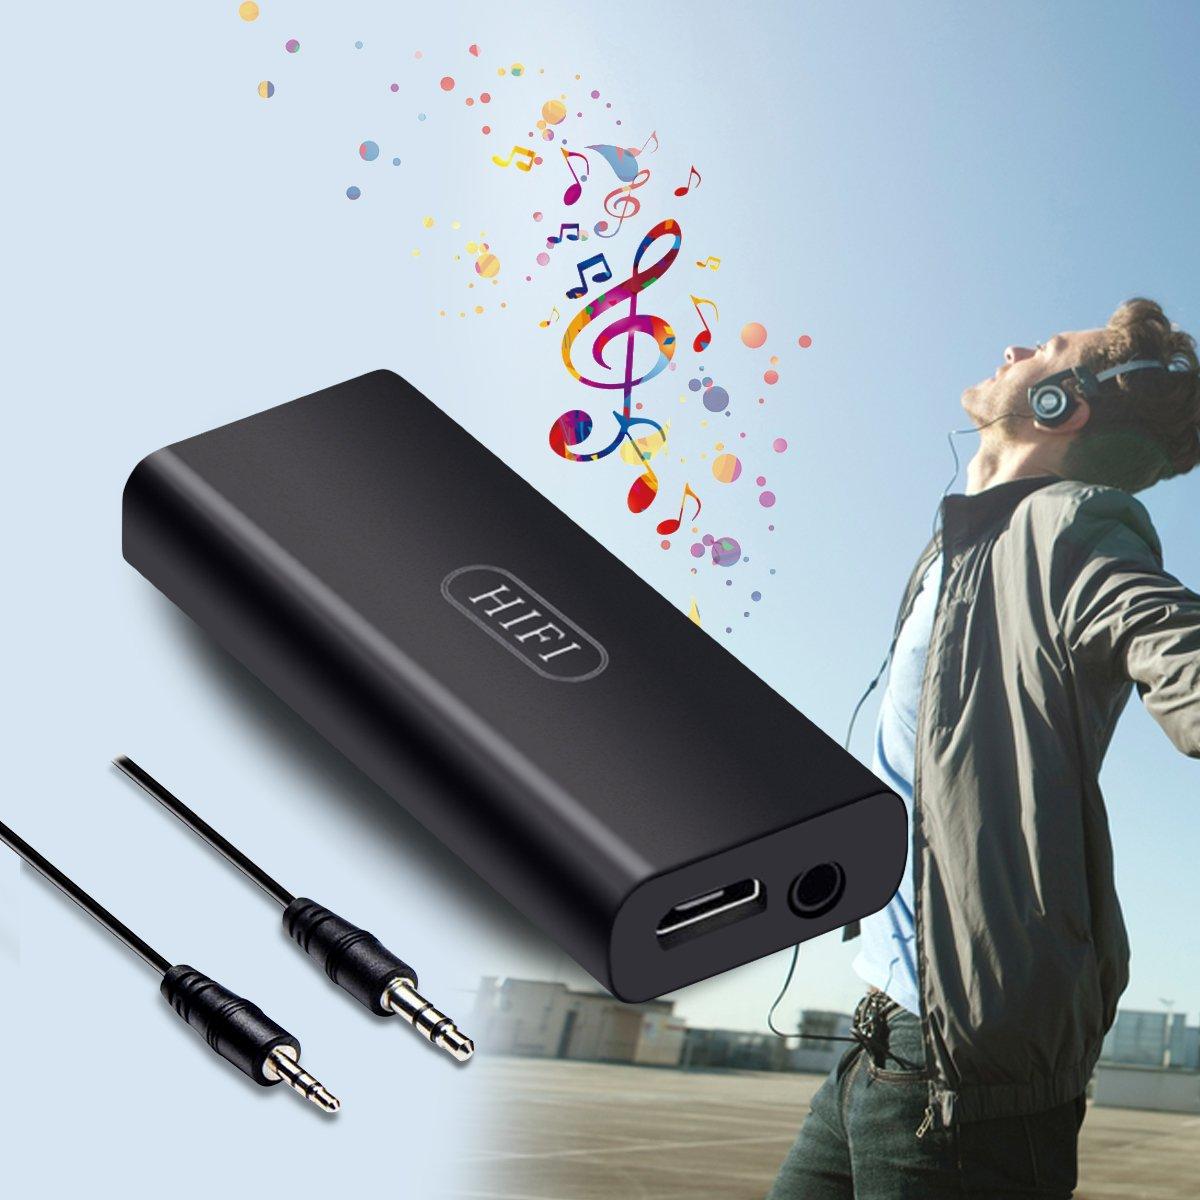 HiFi Headphone Amplifier Portable Stereo Earphone Headphone AMP Rechargeble Audio Amplifier 3.5mm Mini AUX Digital Audio Enchancer